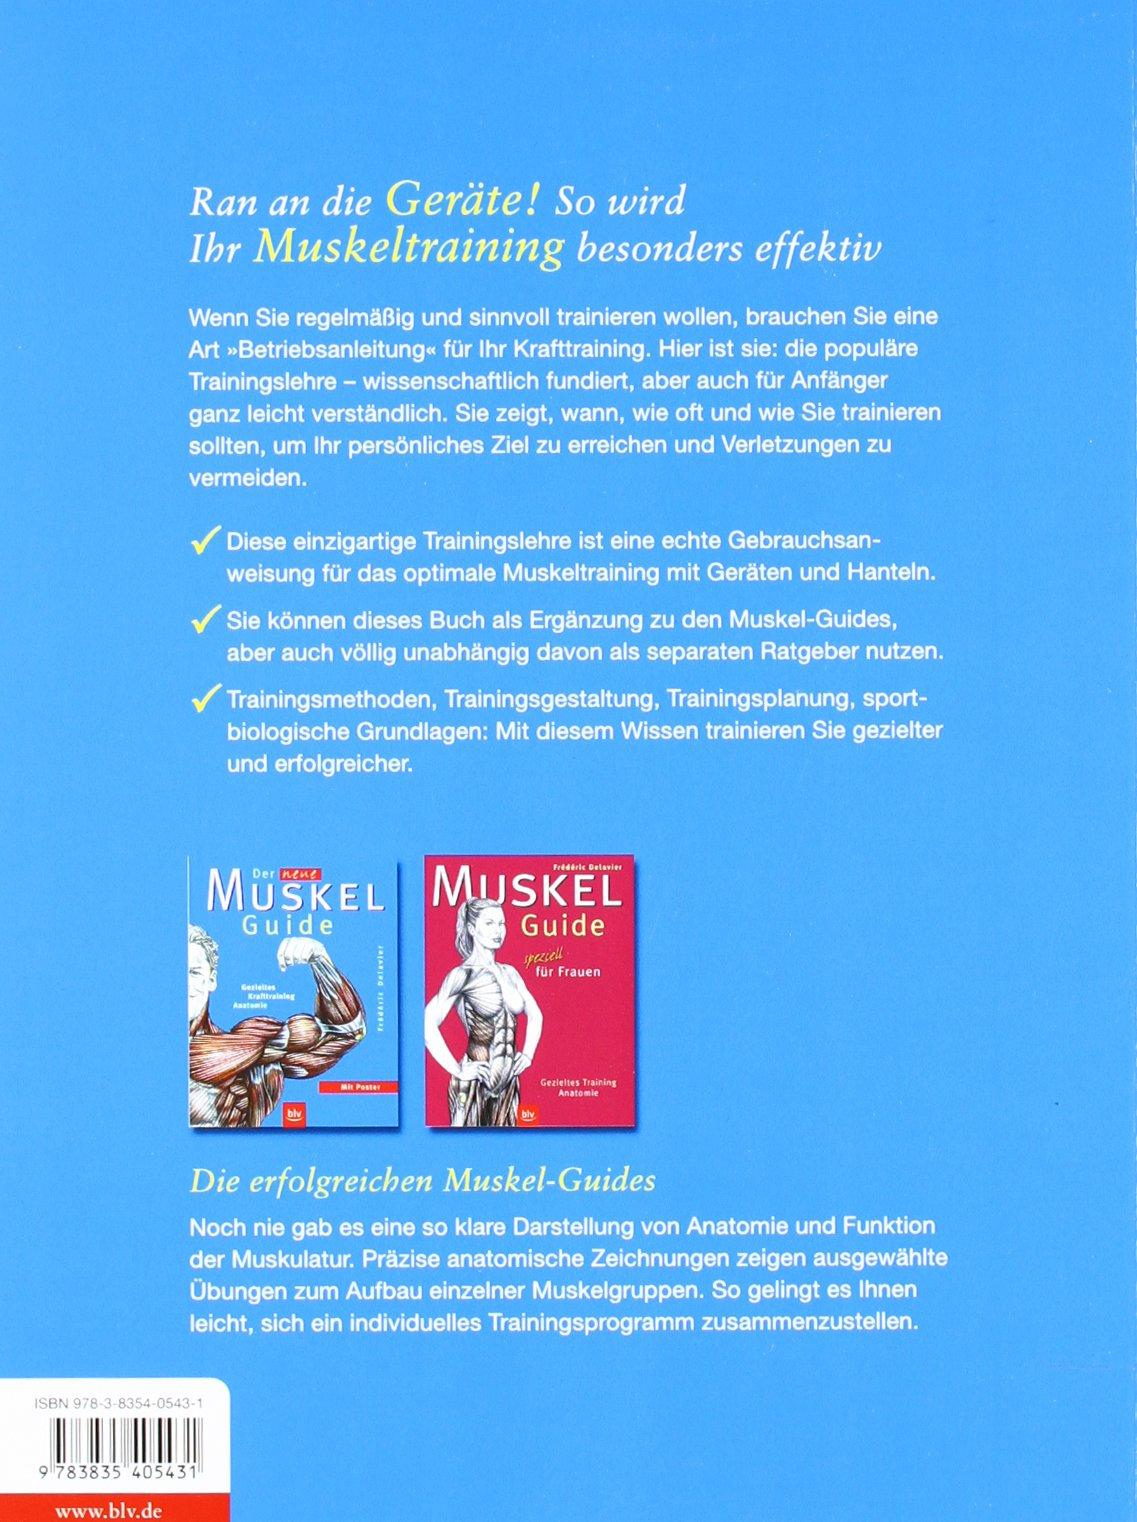 Das Muskel-Trainingsbuch: Die Trainingslehre zum Muskel-Guide ...